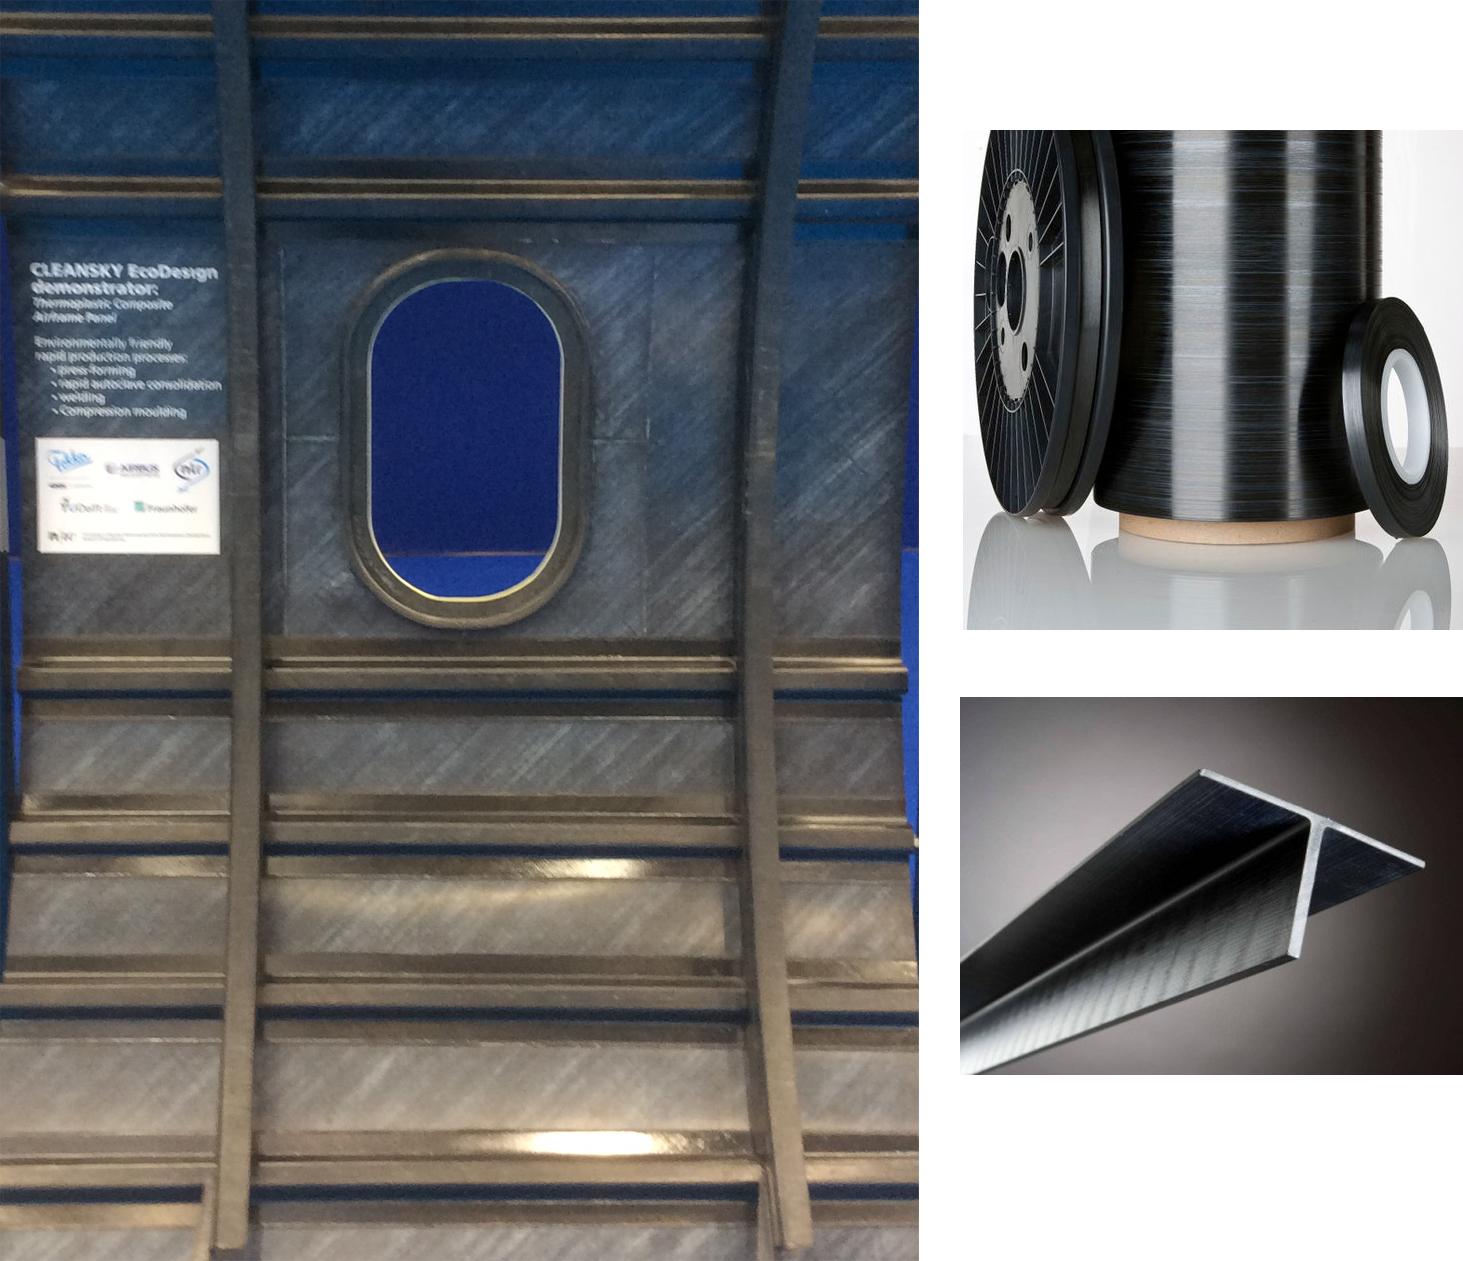 Thermoplastic composites PEEK vs. PEKK vs. PAEK and continuous compression molding (CCM)